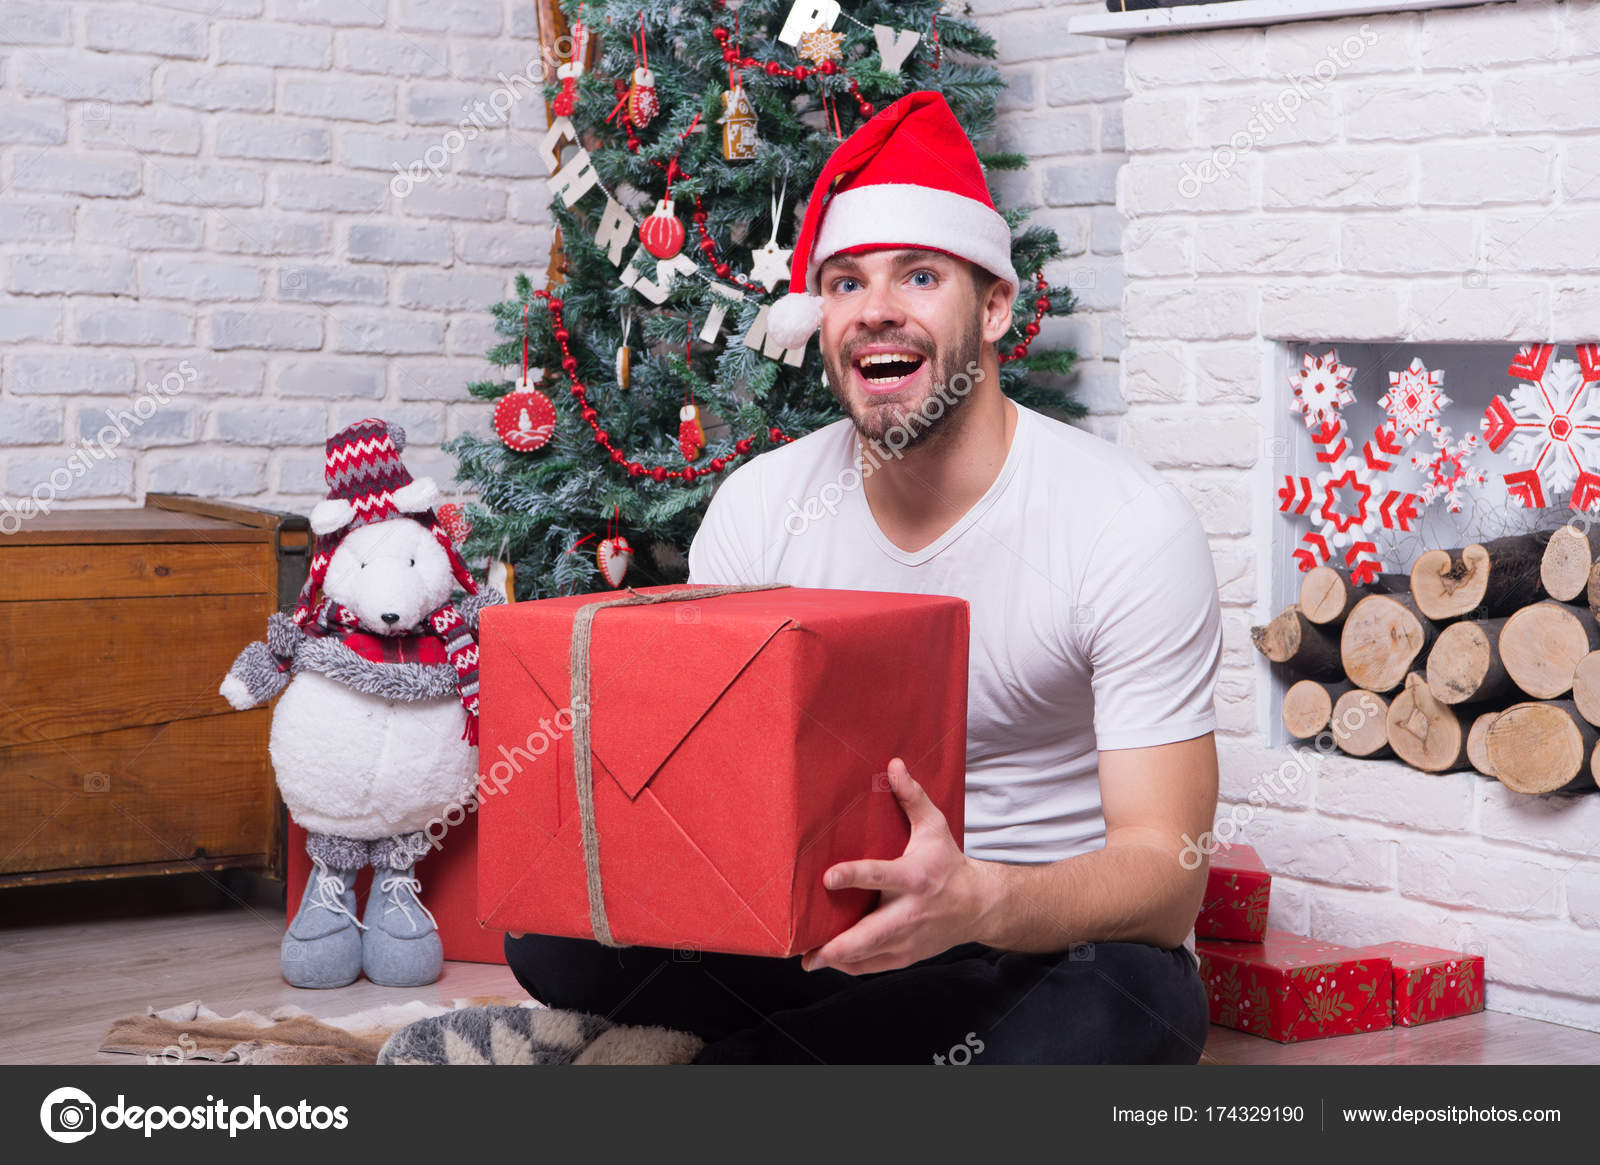 dbceda4aecba5 Man in santa hat sit on floor at fireplace. Macho smile with present box